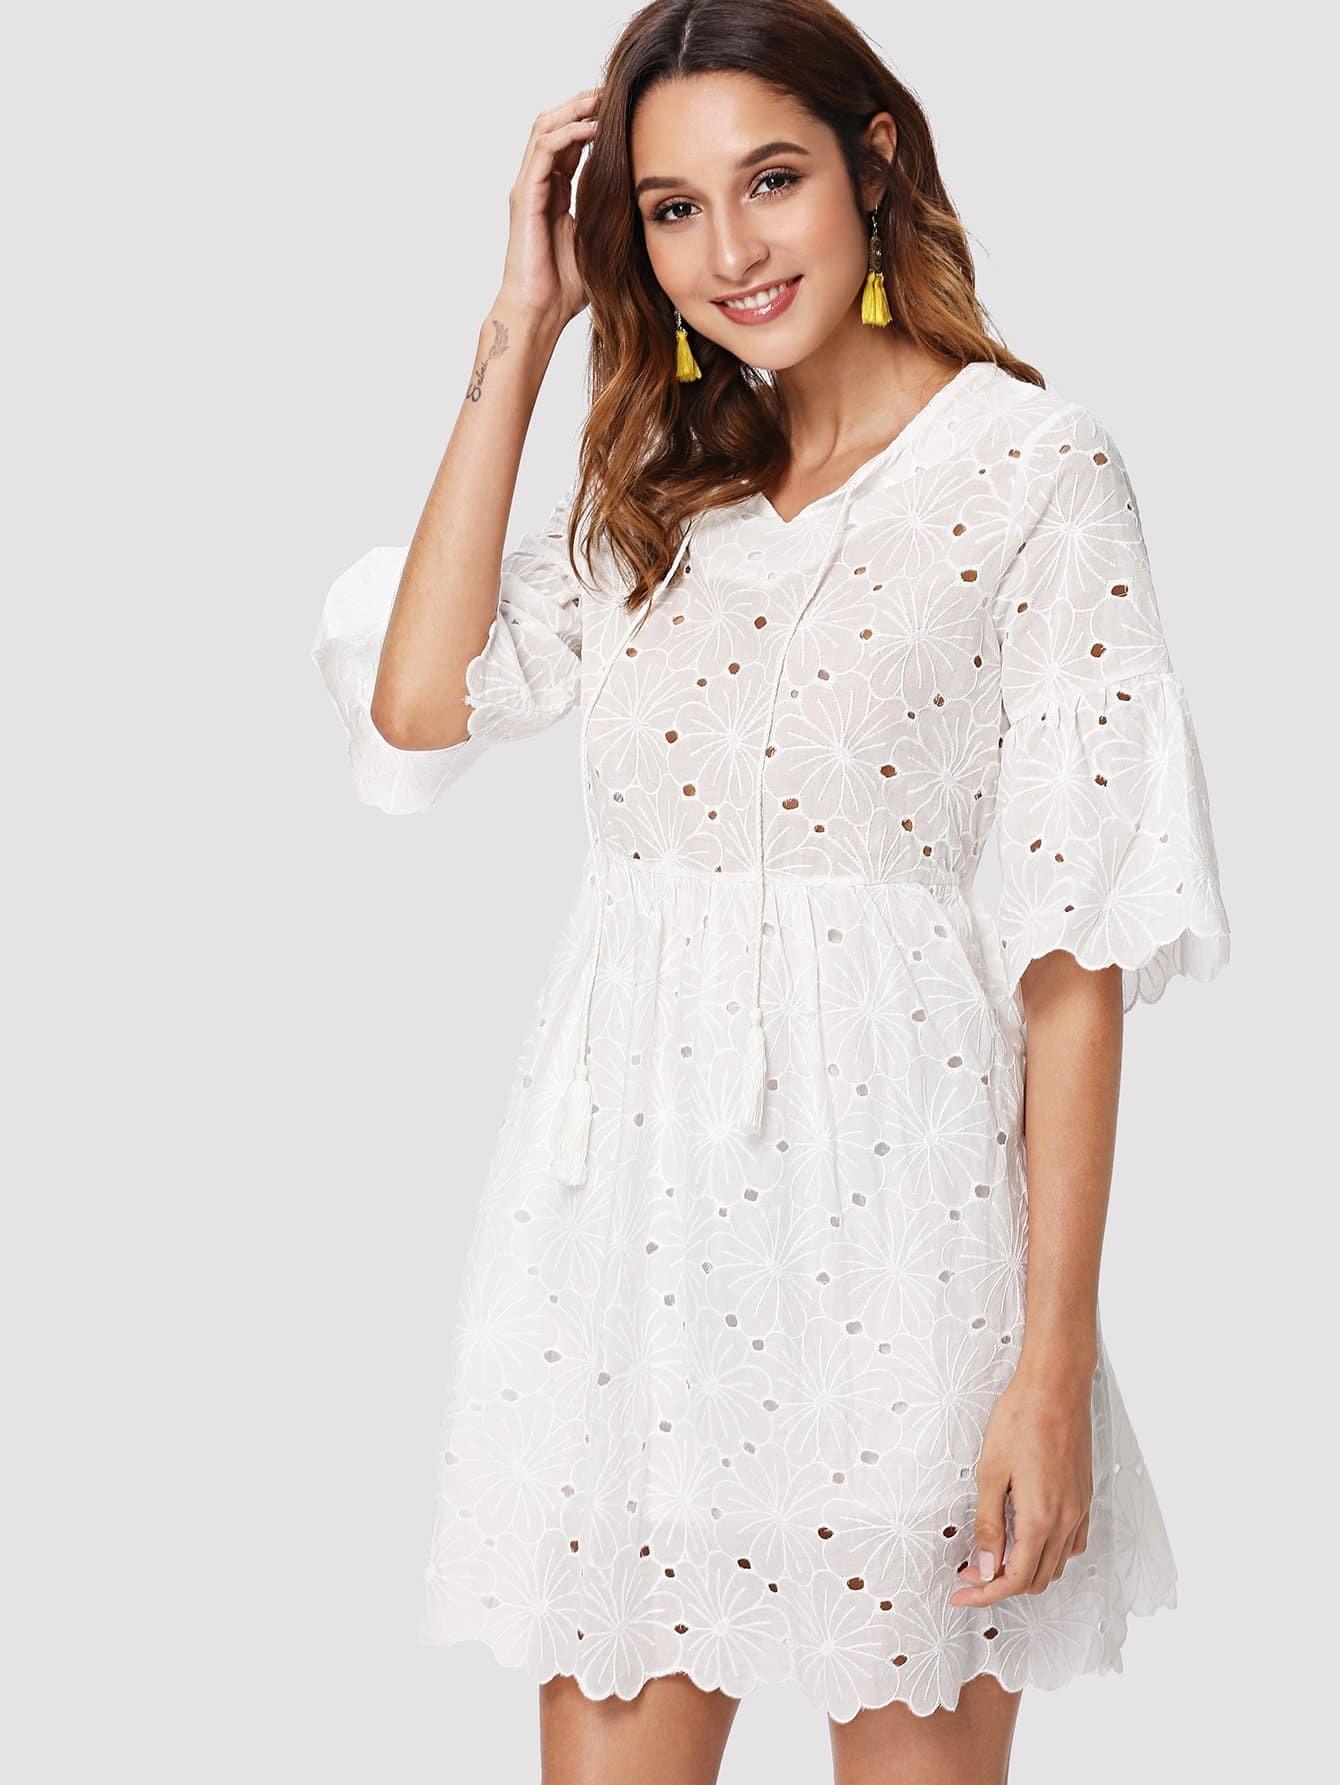 Flounce Sleeve Eyelet Embroidery Dress flounce sleeve eyelet embroidery dress